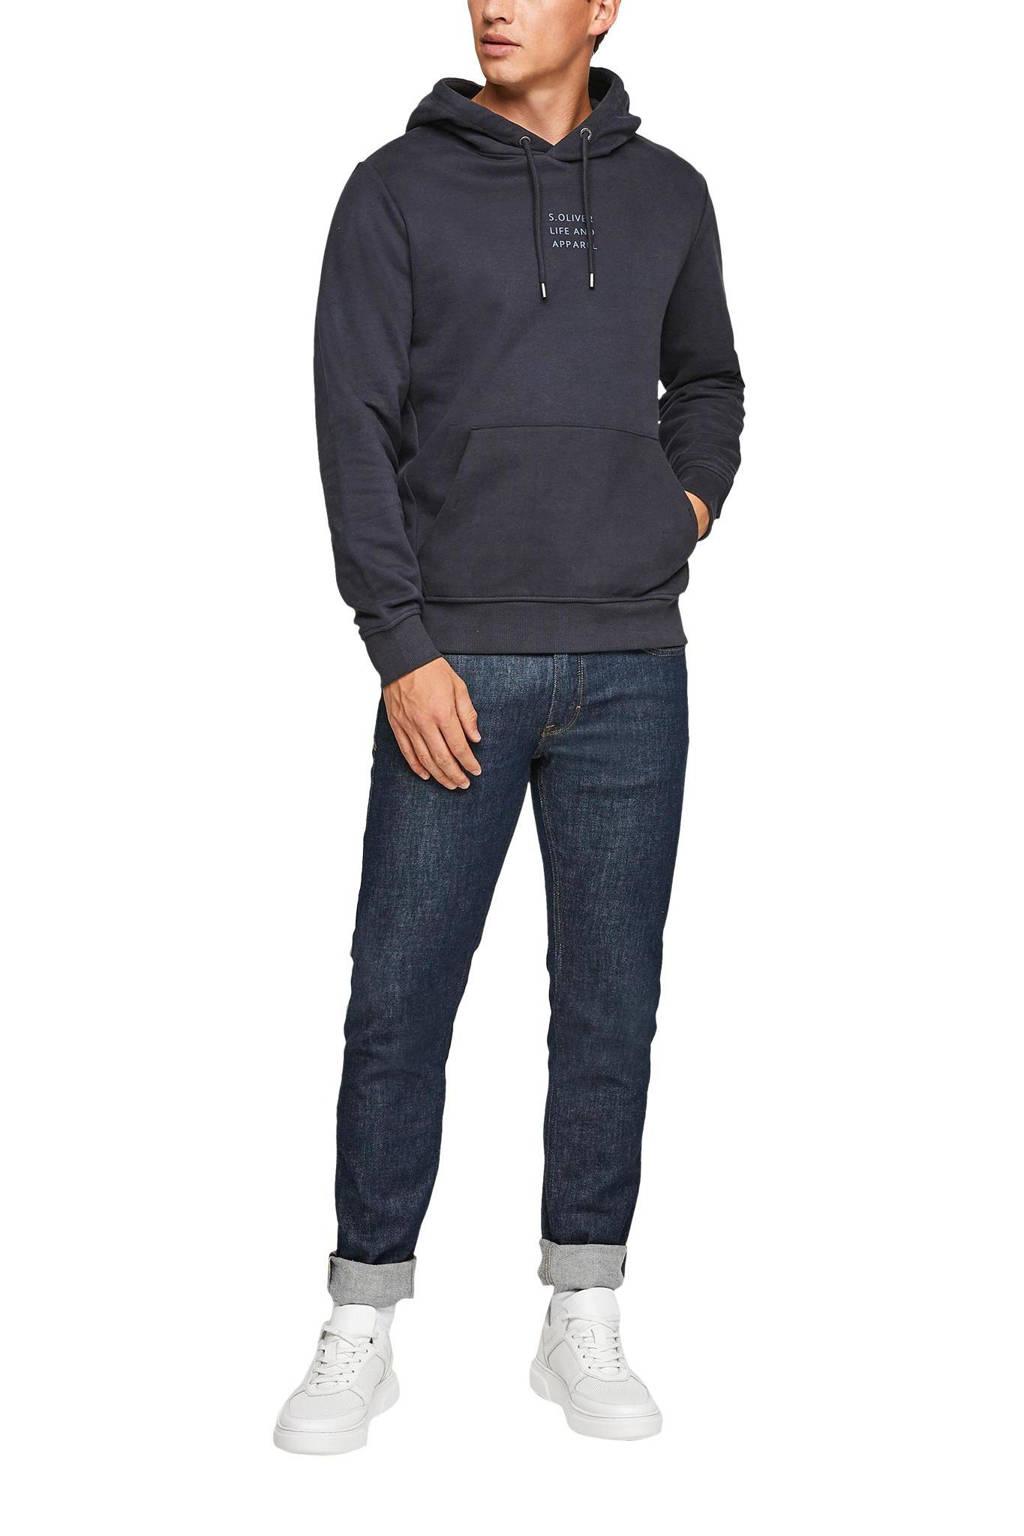 s.Oliver hoodie met logo donkerblauw, Donkerblauw